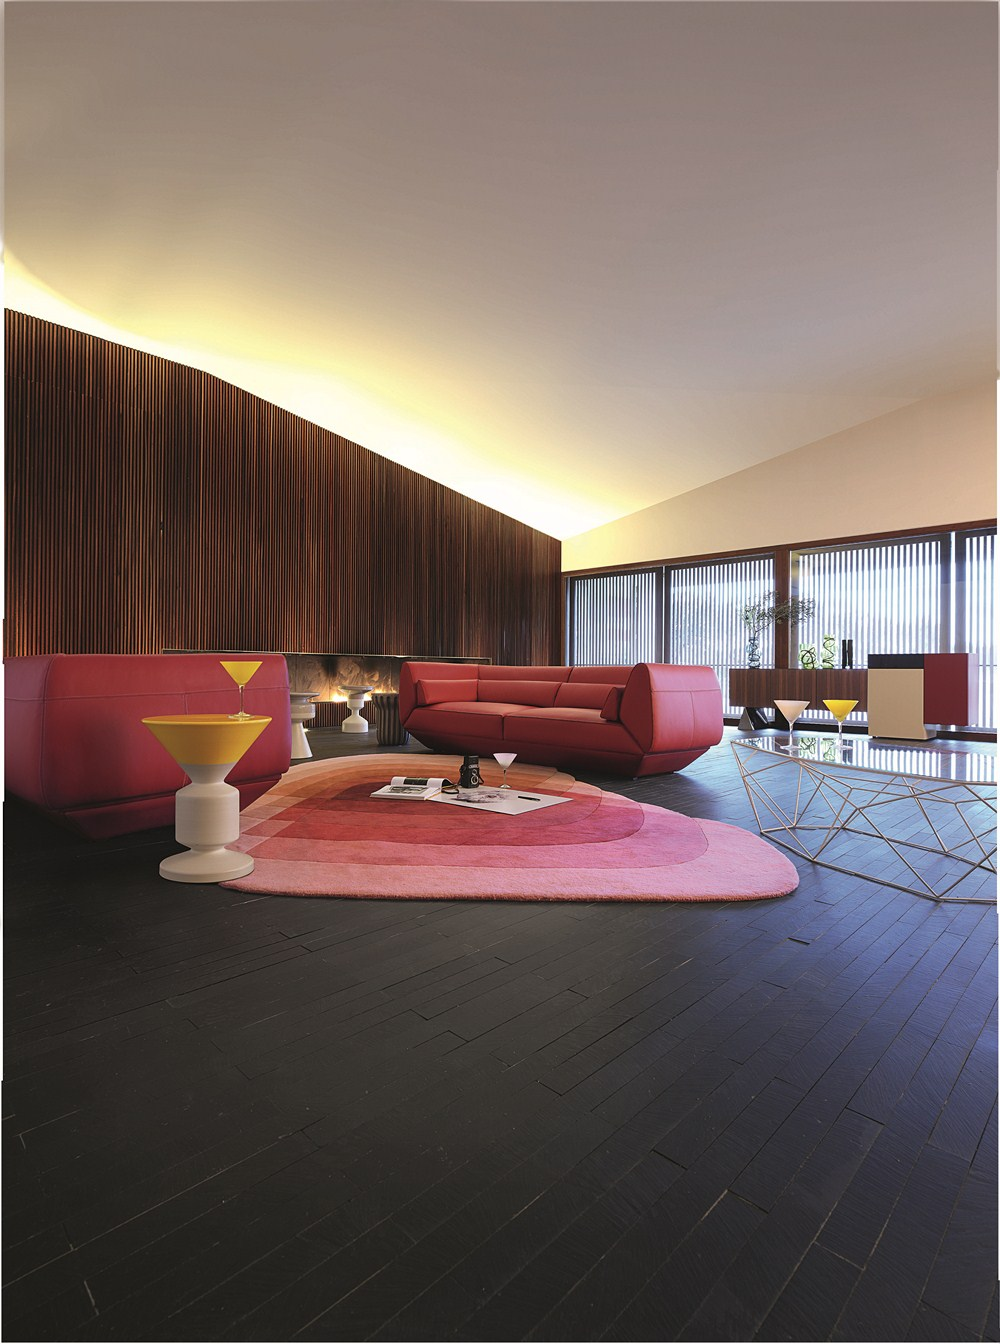 roche bobois collection printemps t 2013. Black Bedroom Furniture Sets. Home Design Ideas